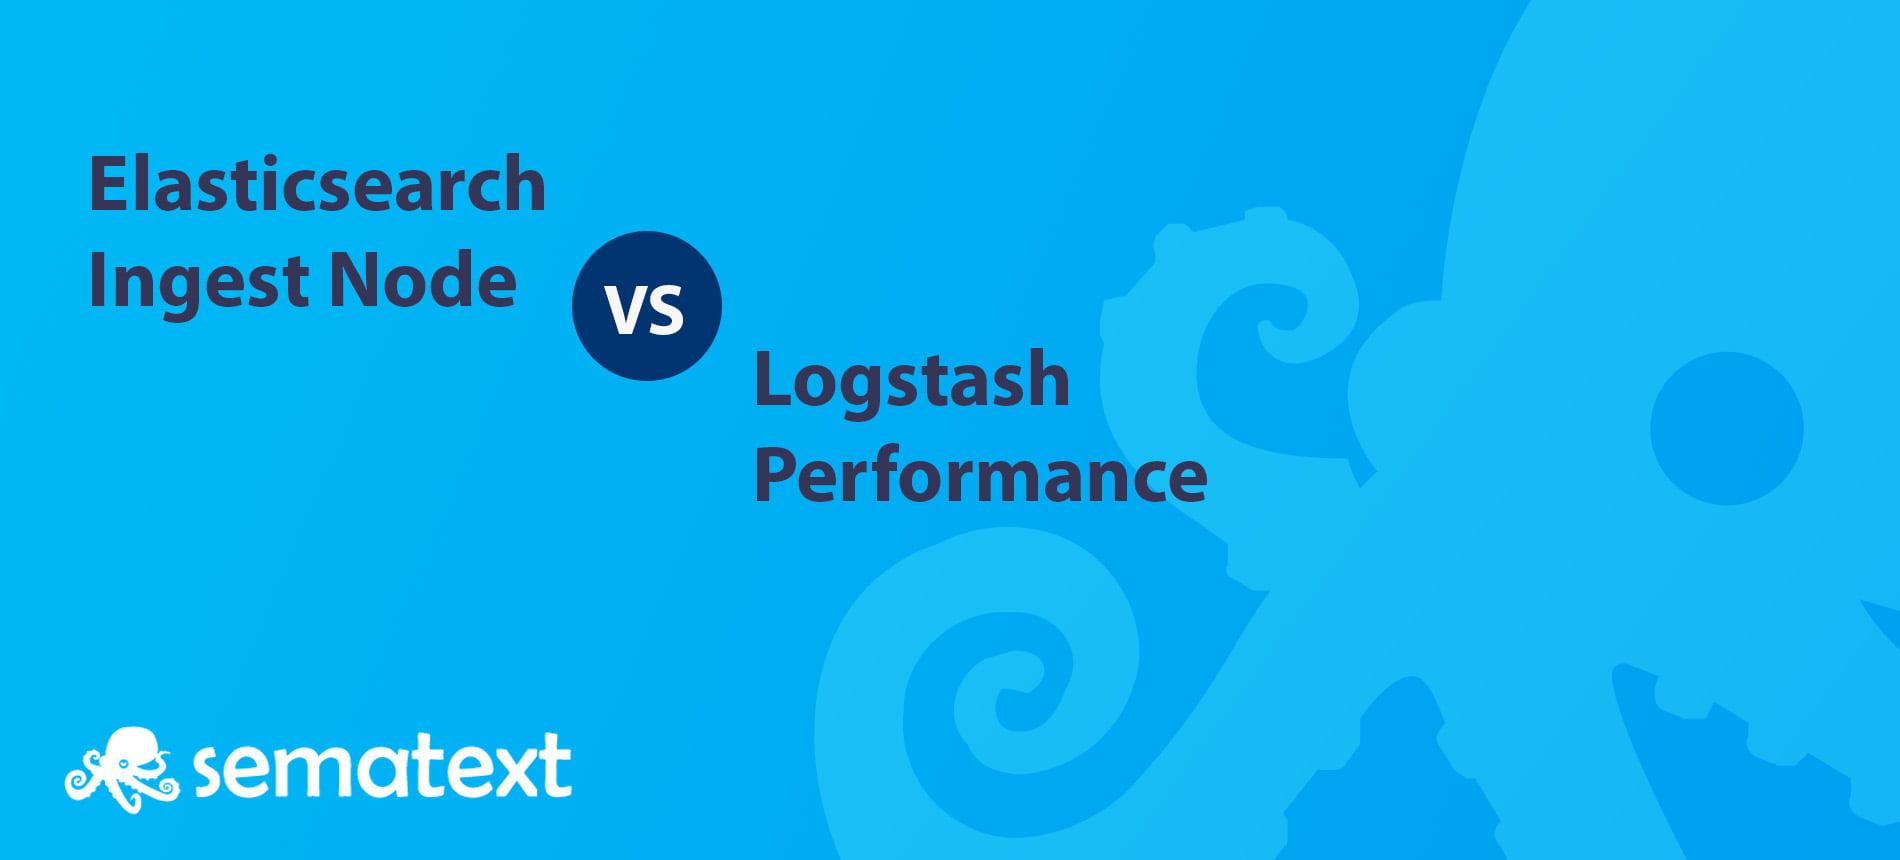 Elasticsearch vs Logstash Performance: Testing Ingest Node - Sematext